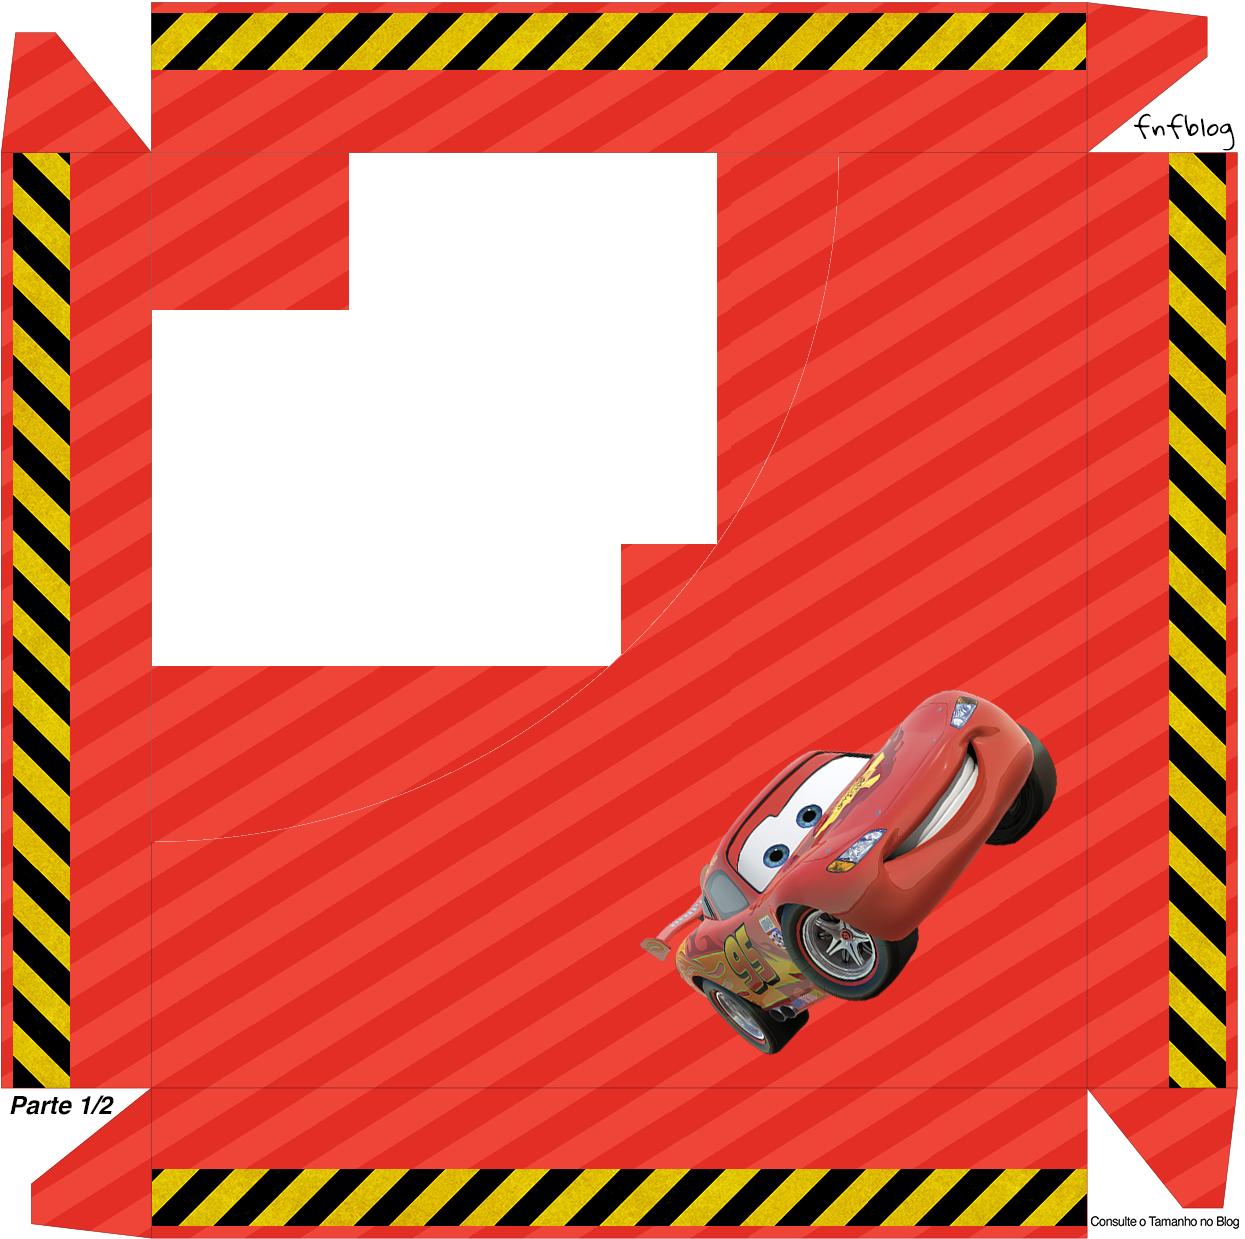 Caixa de Bombom Tampa Carros Disney